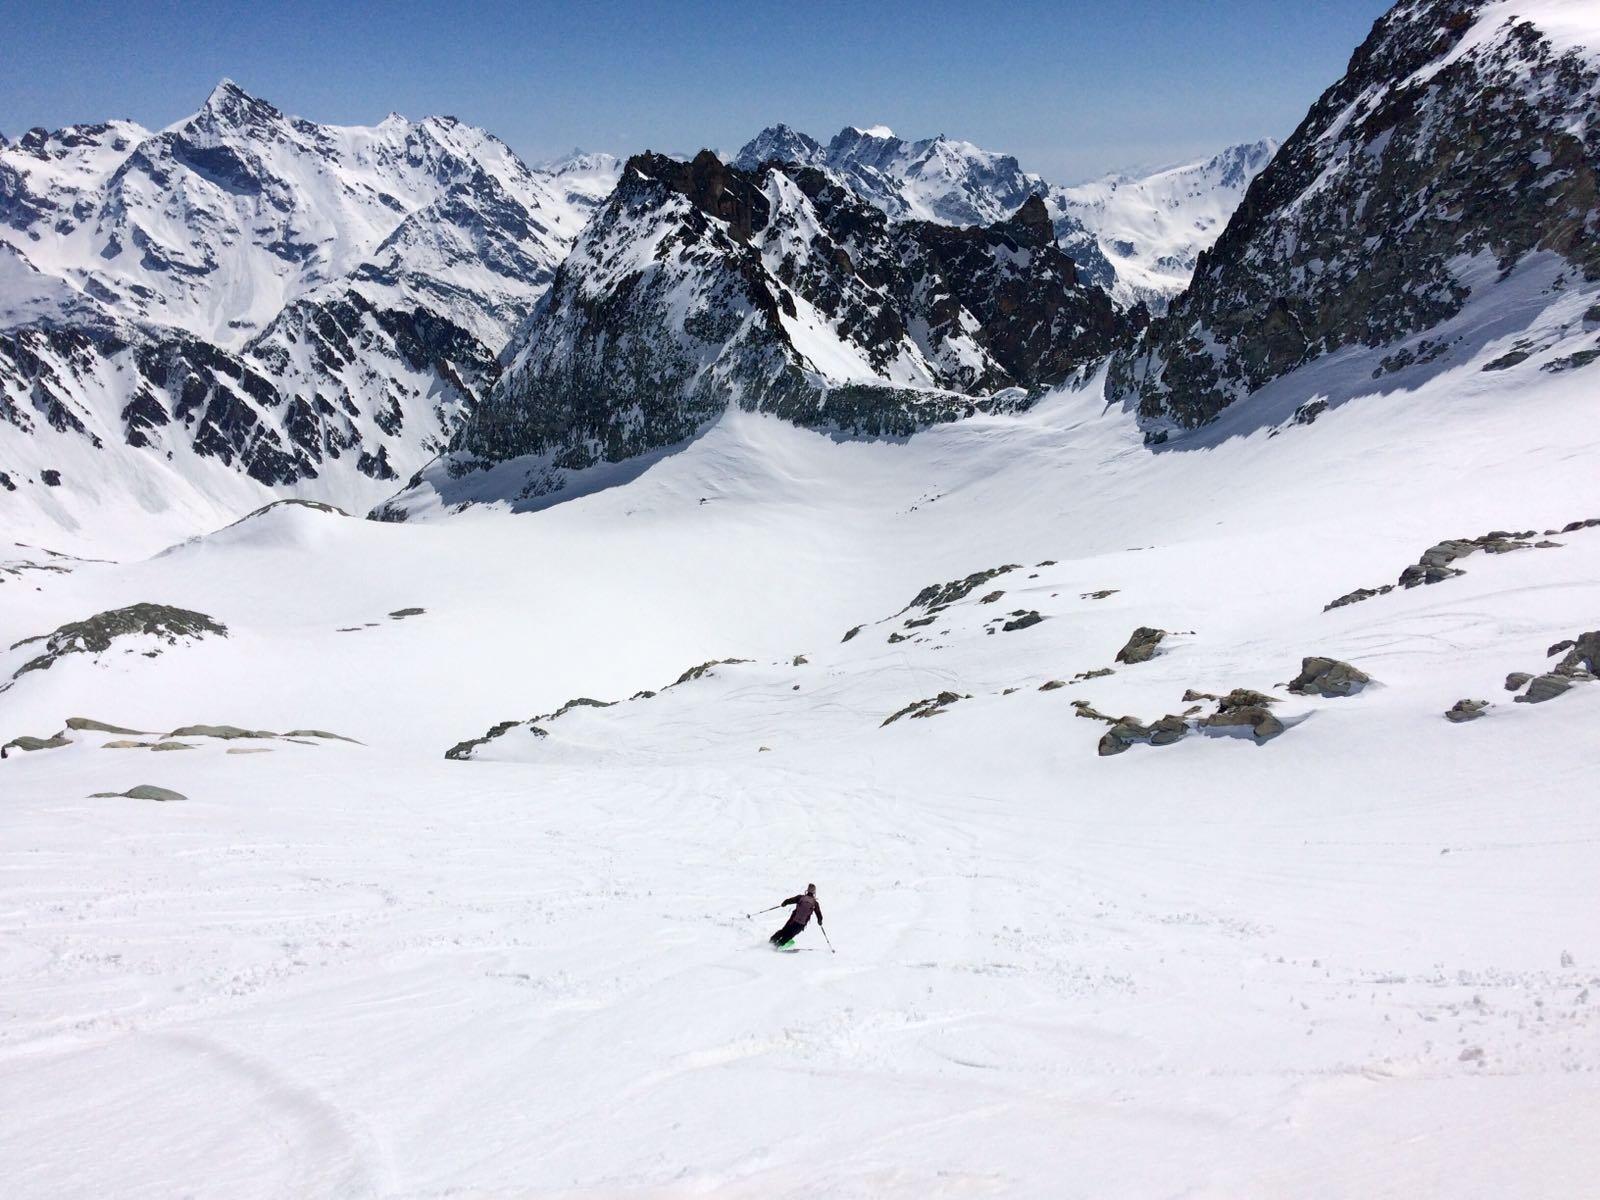 Discesa spettacolare su neve primaverile vellutata